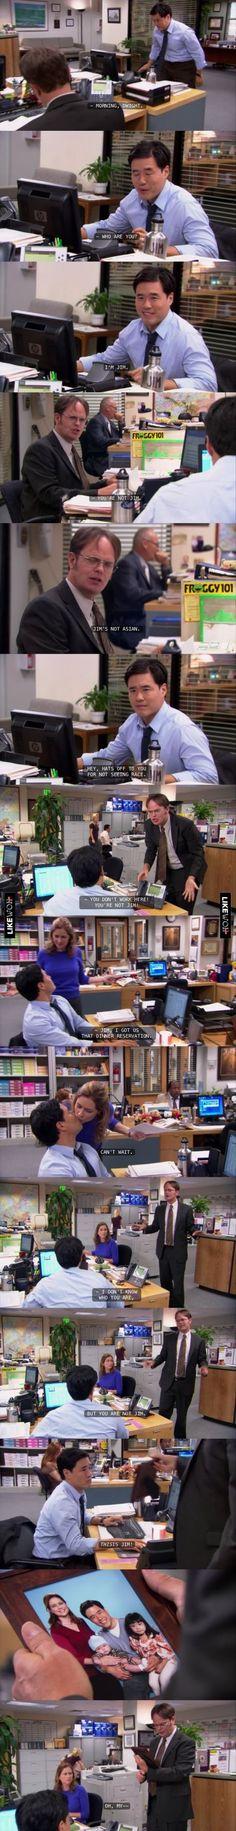 One of Jim's best pranks #theoffice